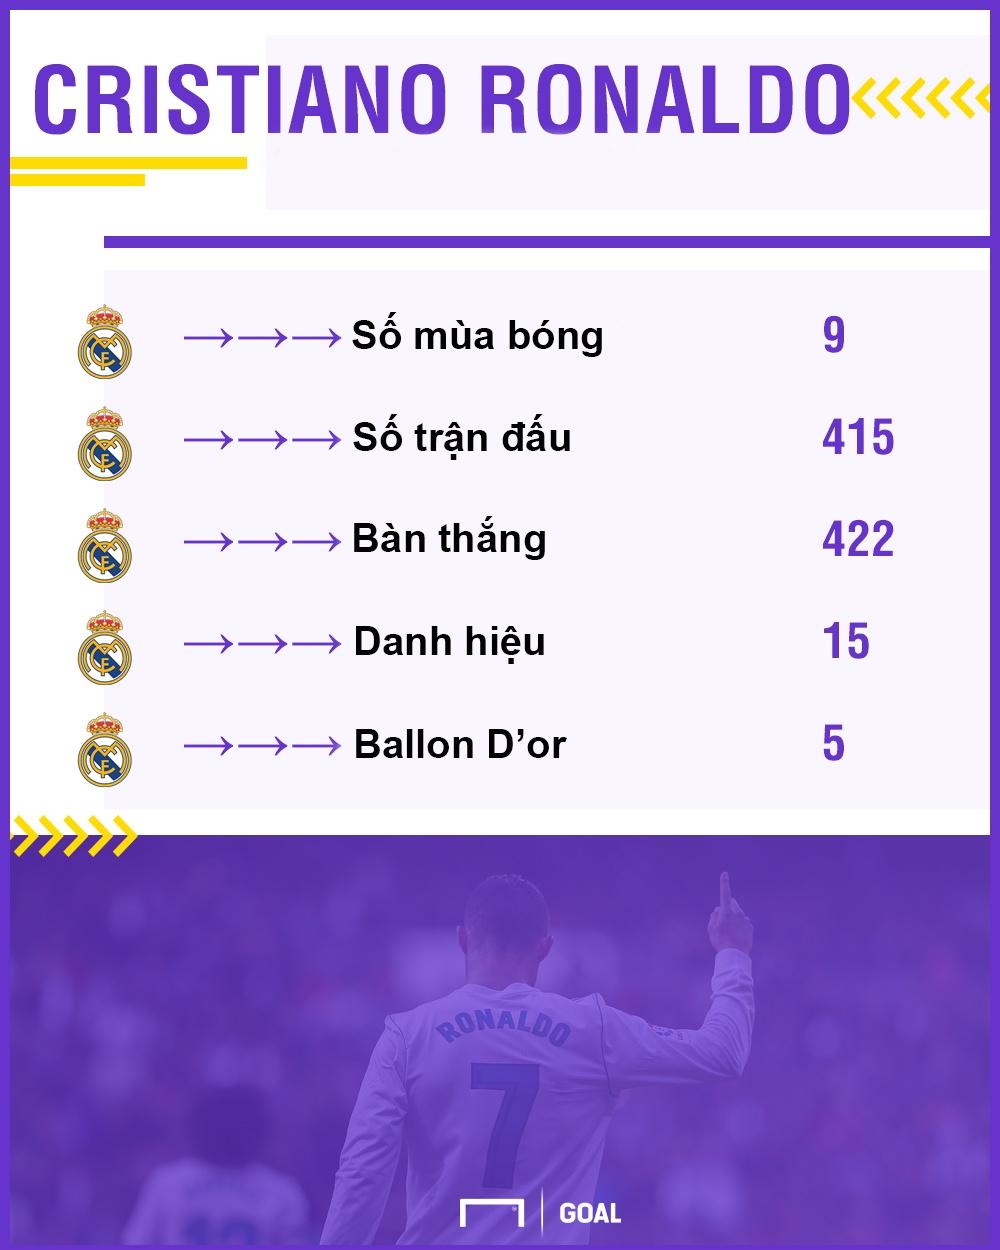 Cac danh thu Real noi gi khi Ronaldo tu nhan gioi nhat lich su? hinh anh 4